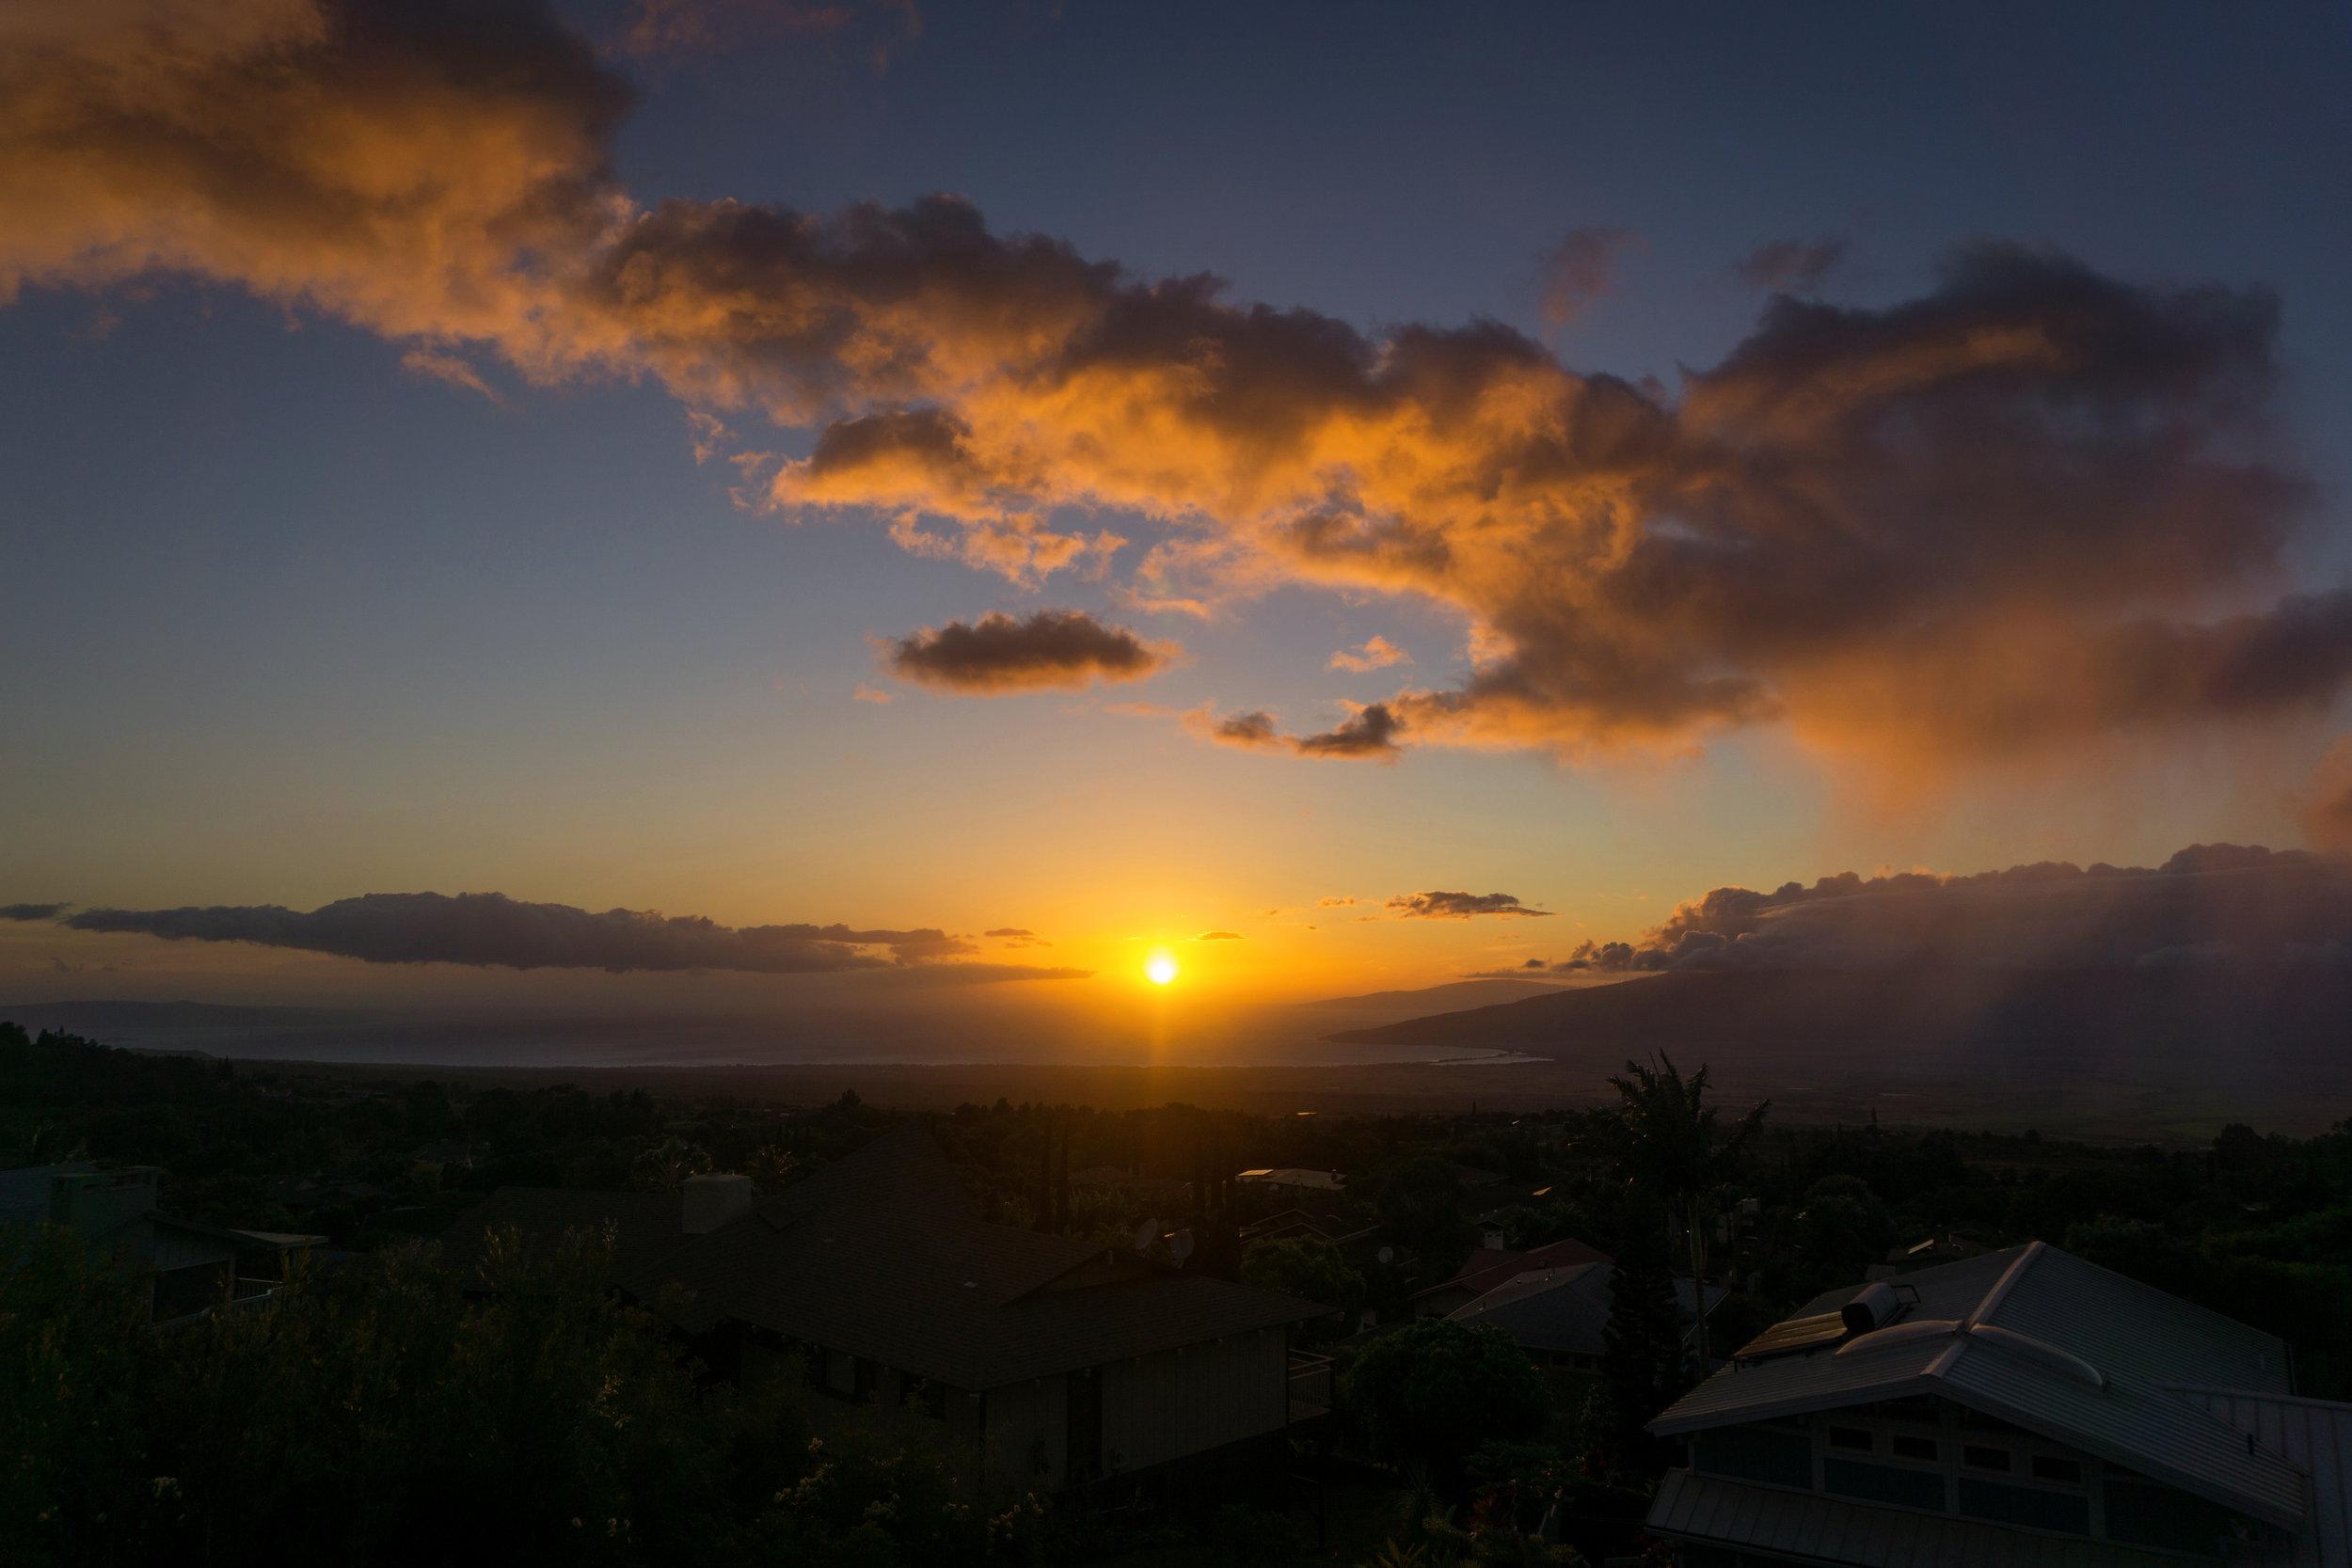 AstroBandit_Maui_Hawaii_JordanRose_Kula_Sunset_30.jpg